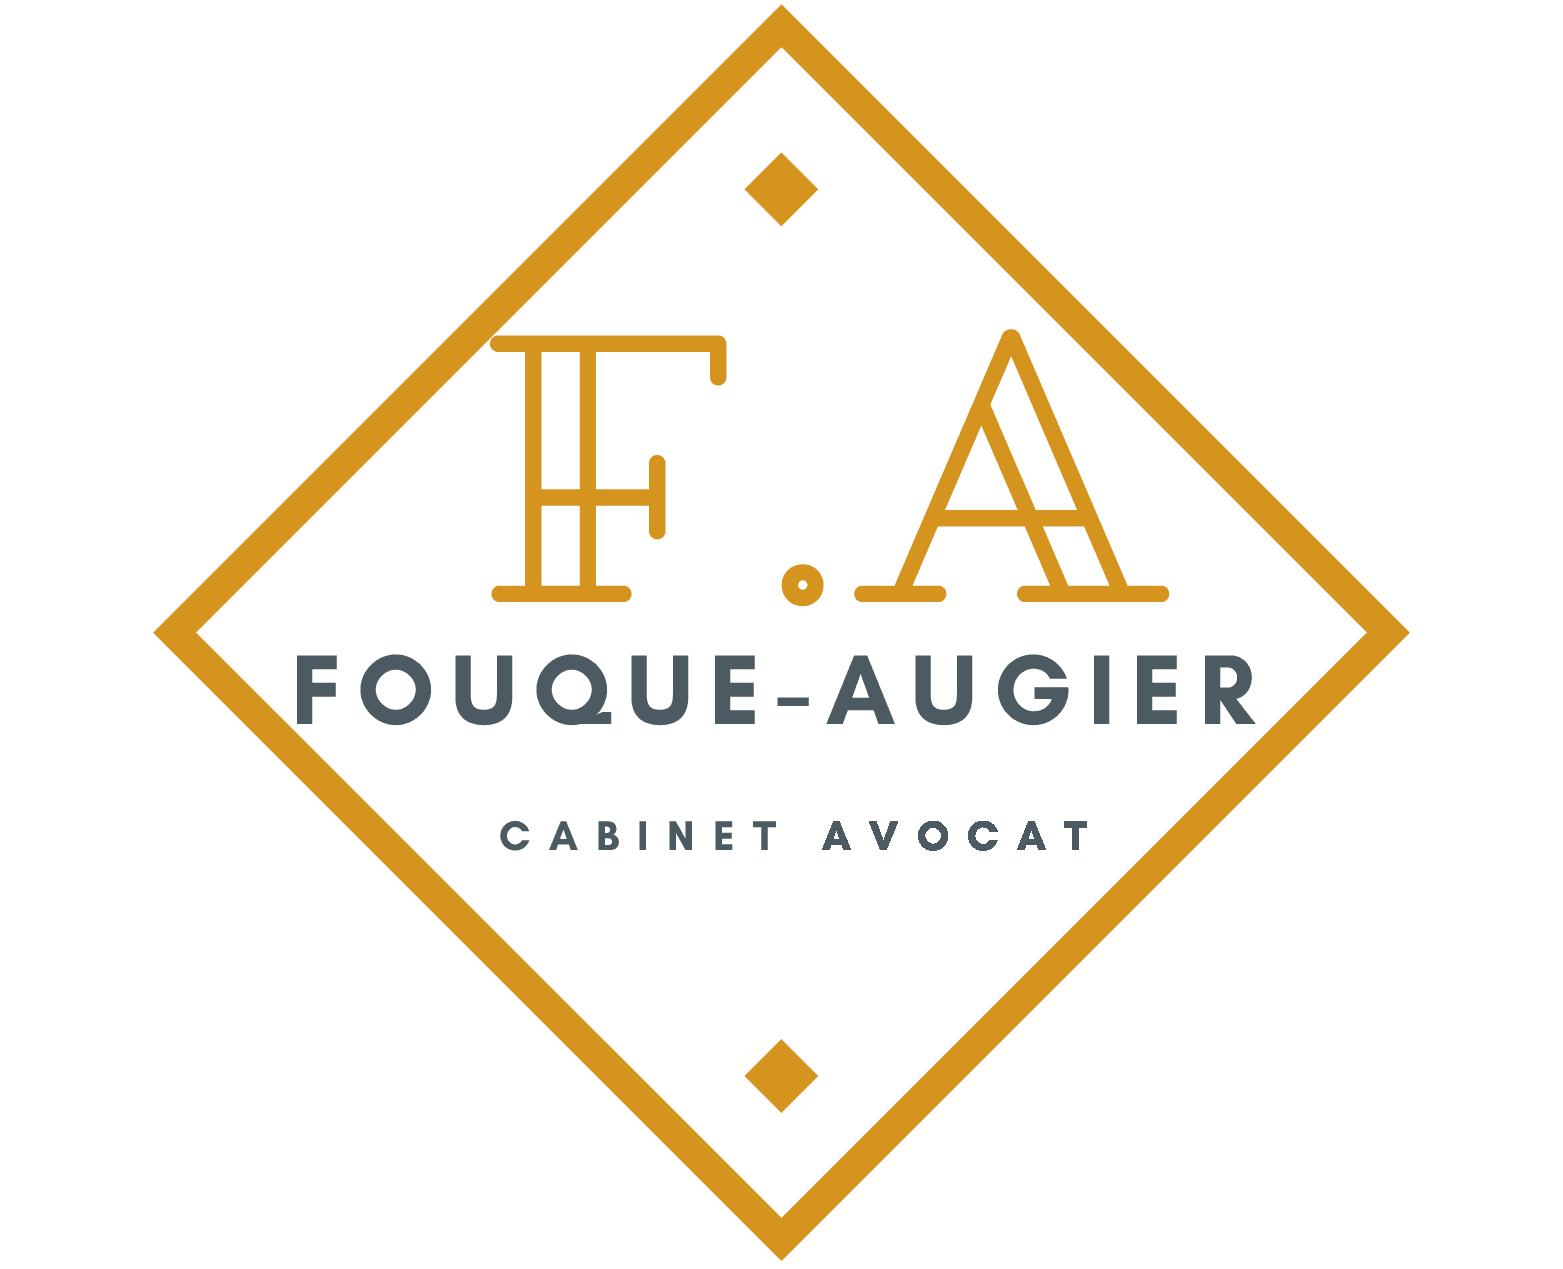 Fouque-Augier Avocat